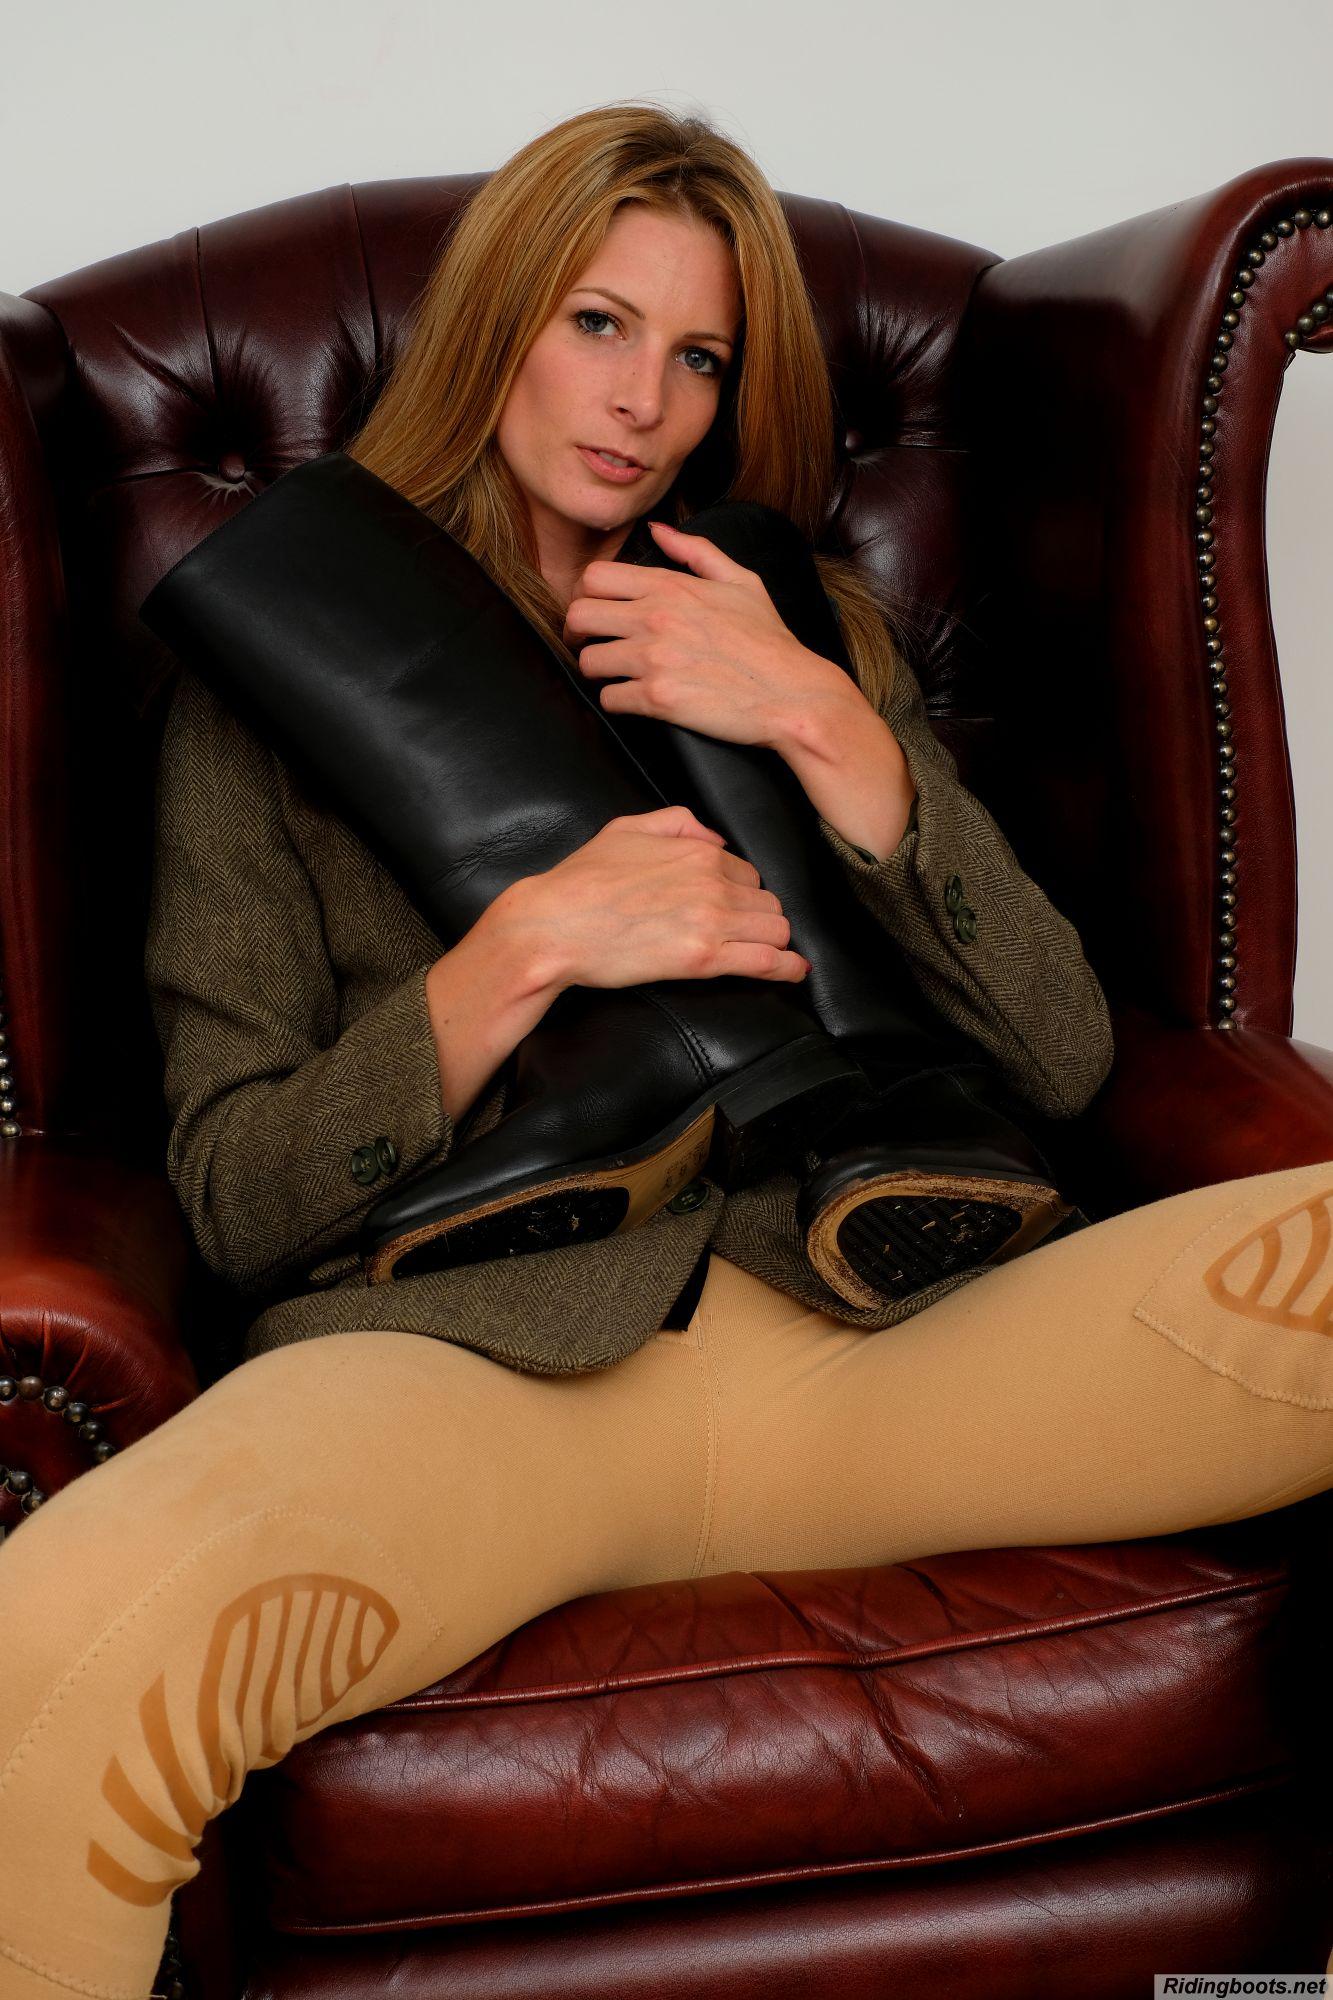 Rebecca Leah in ridingboots.